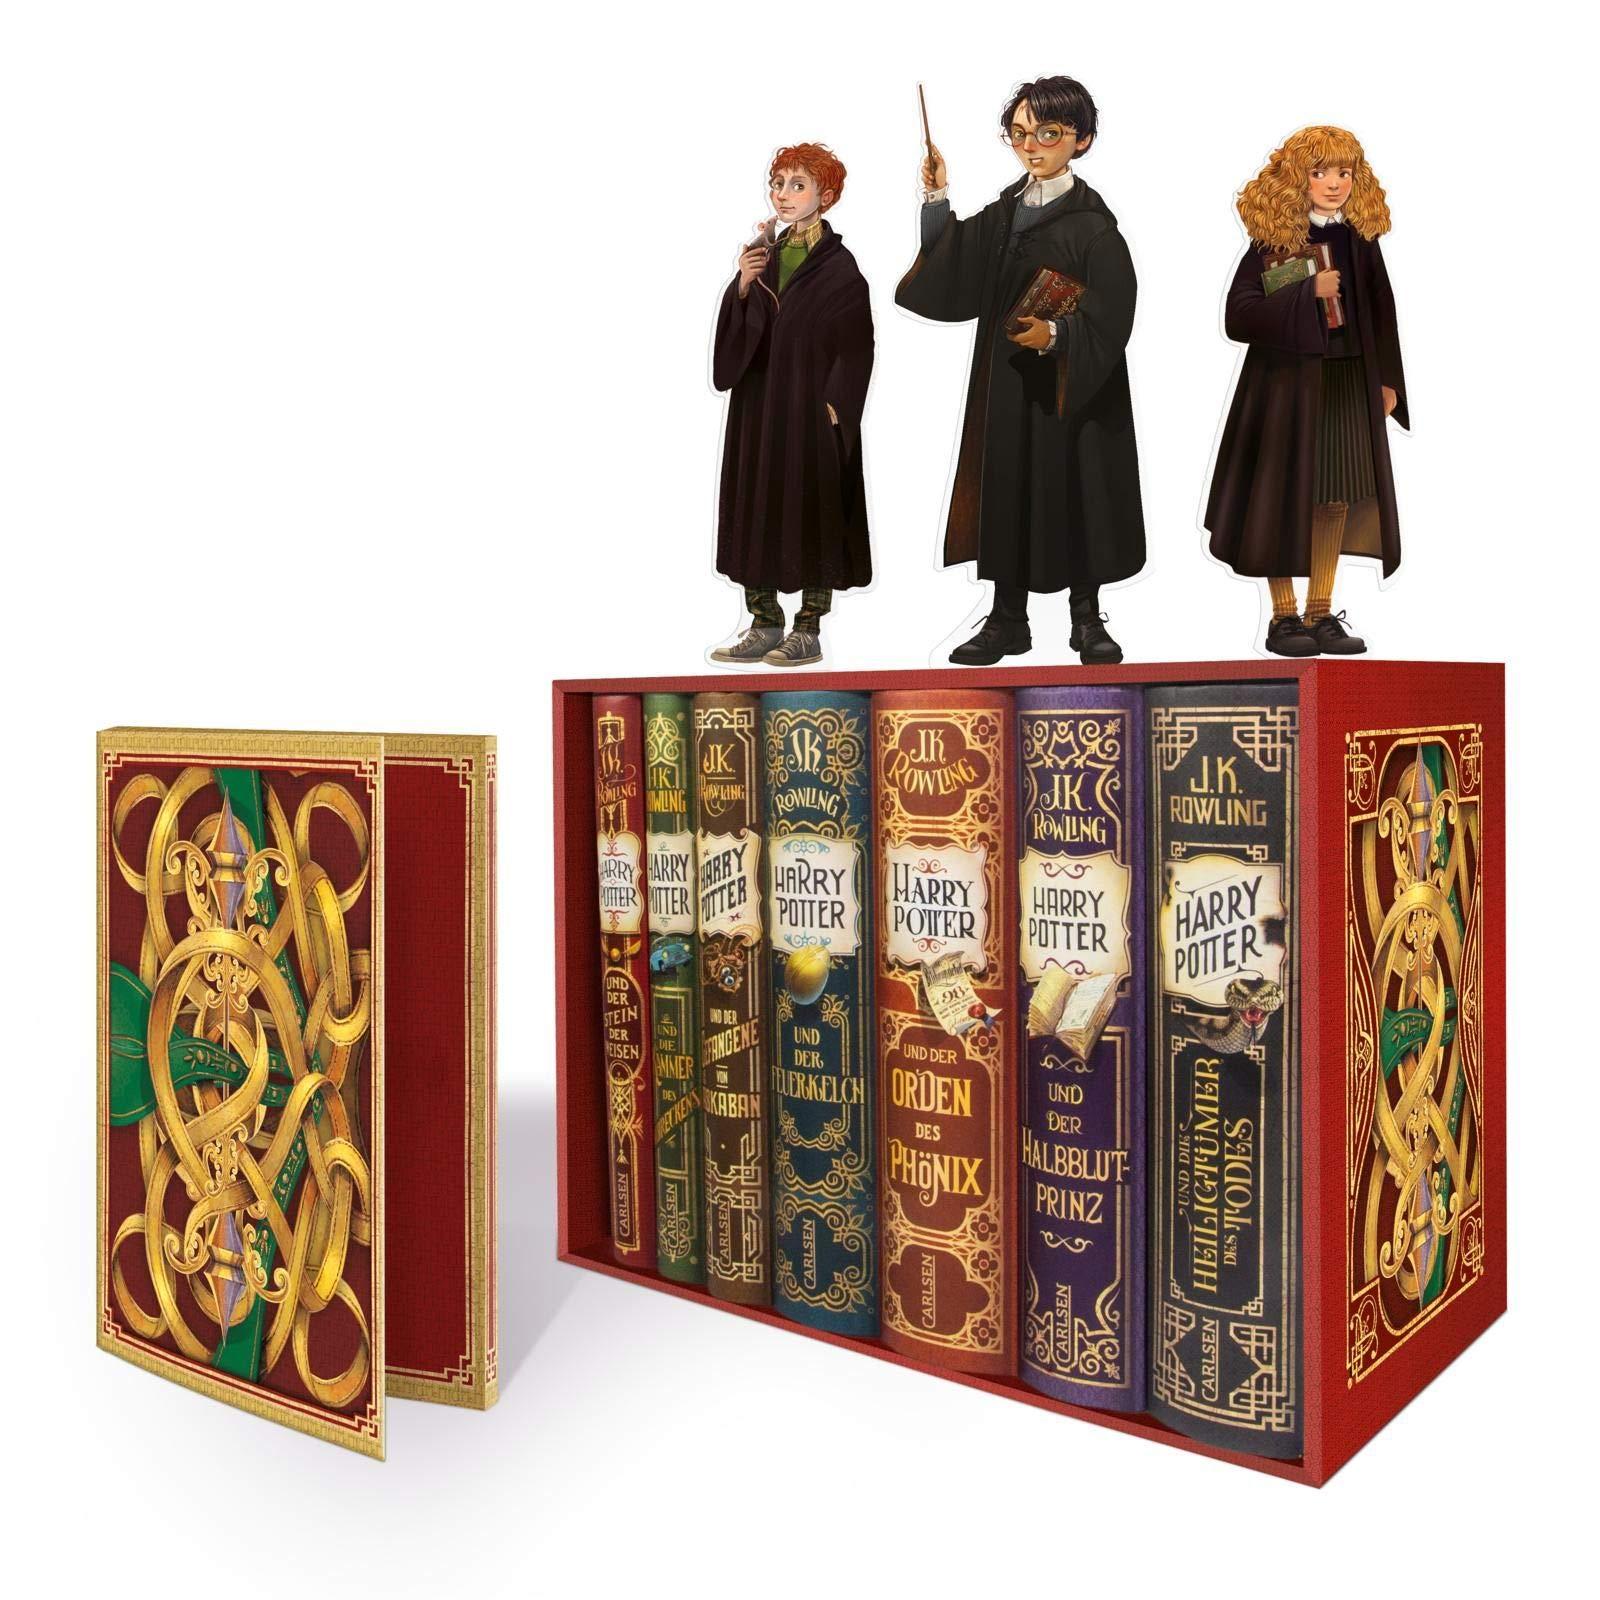 Harry Potter Band 1 7 Im Schuber Mit Exklusivem Extra Harry Potter Rowling J K 9783551557407 Amazon Com Books